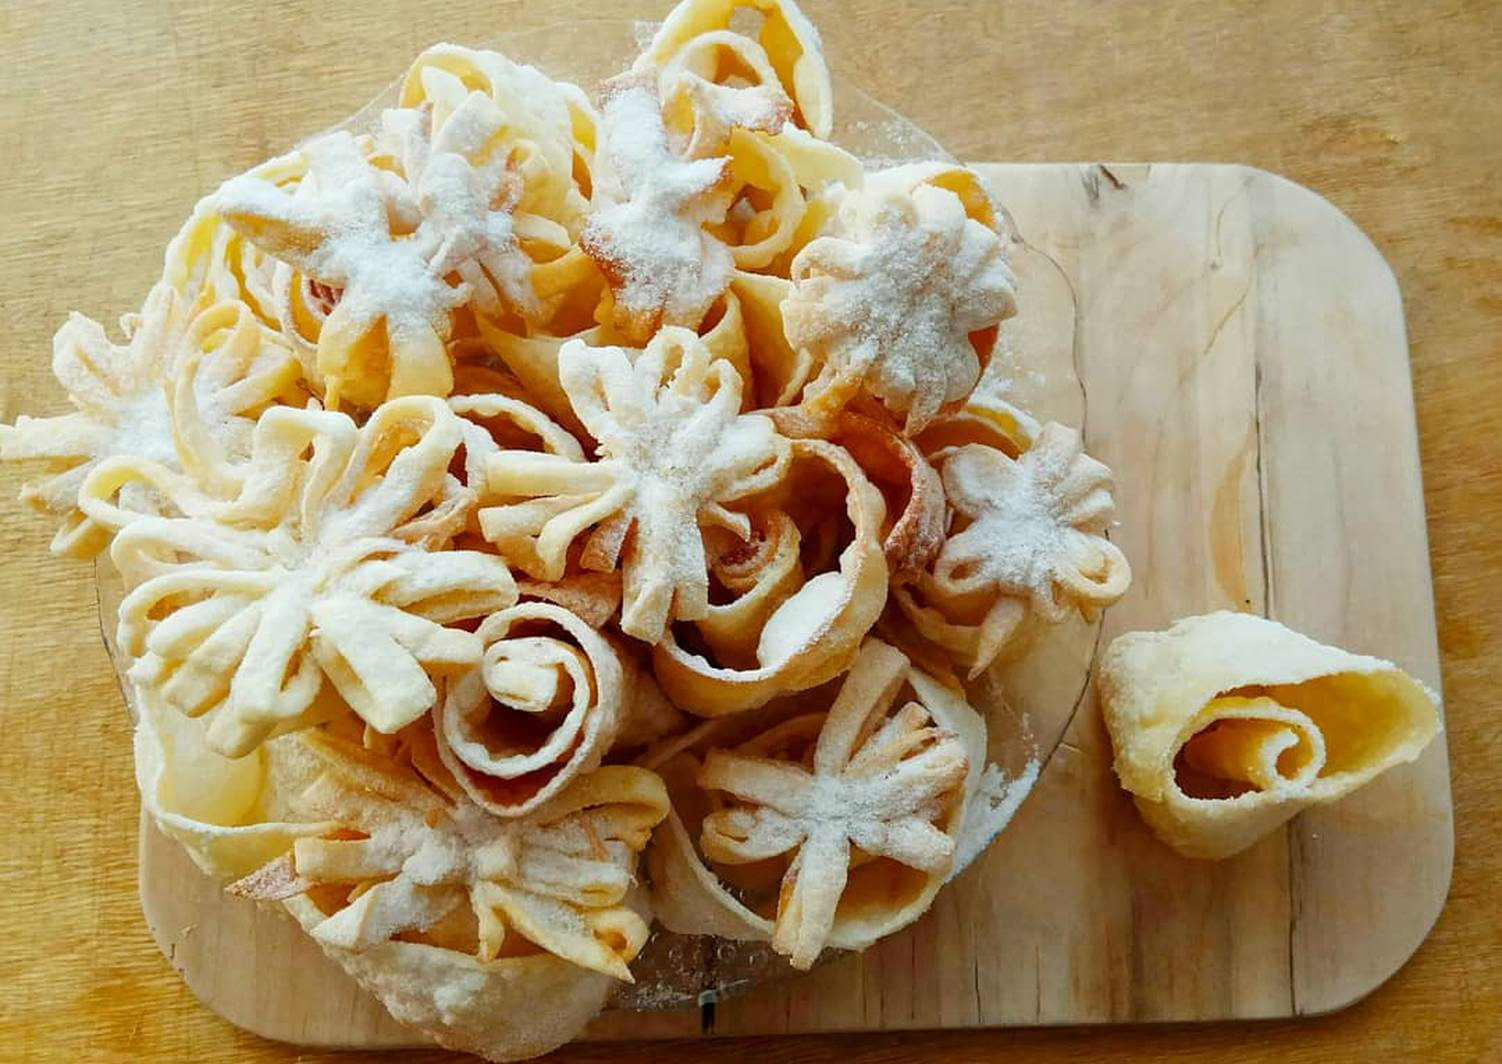 Балеш татарский пирог рецепт с фото средних цен